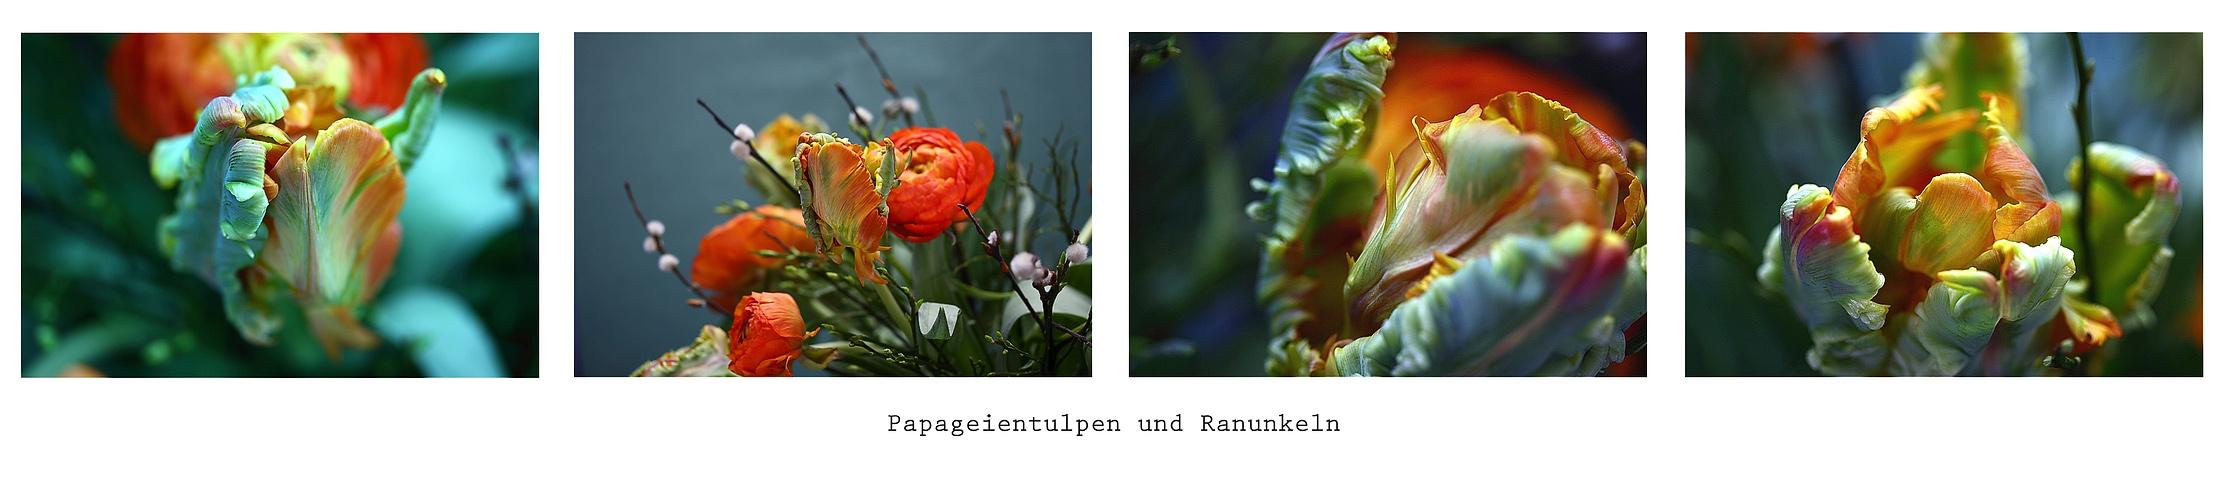 Papageientulpen und Ranunkeln